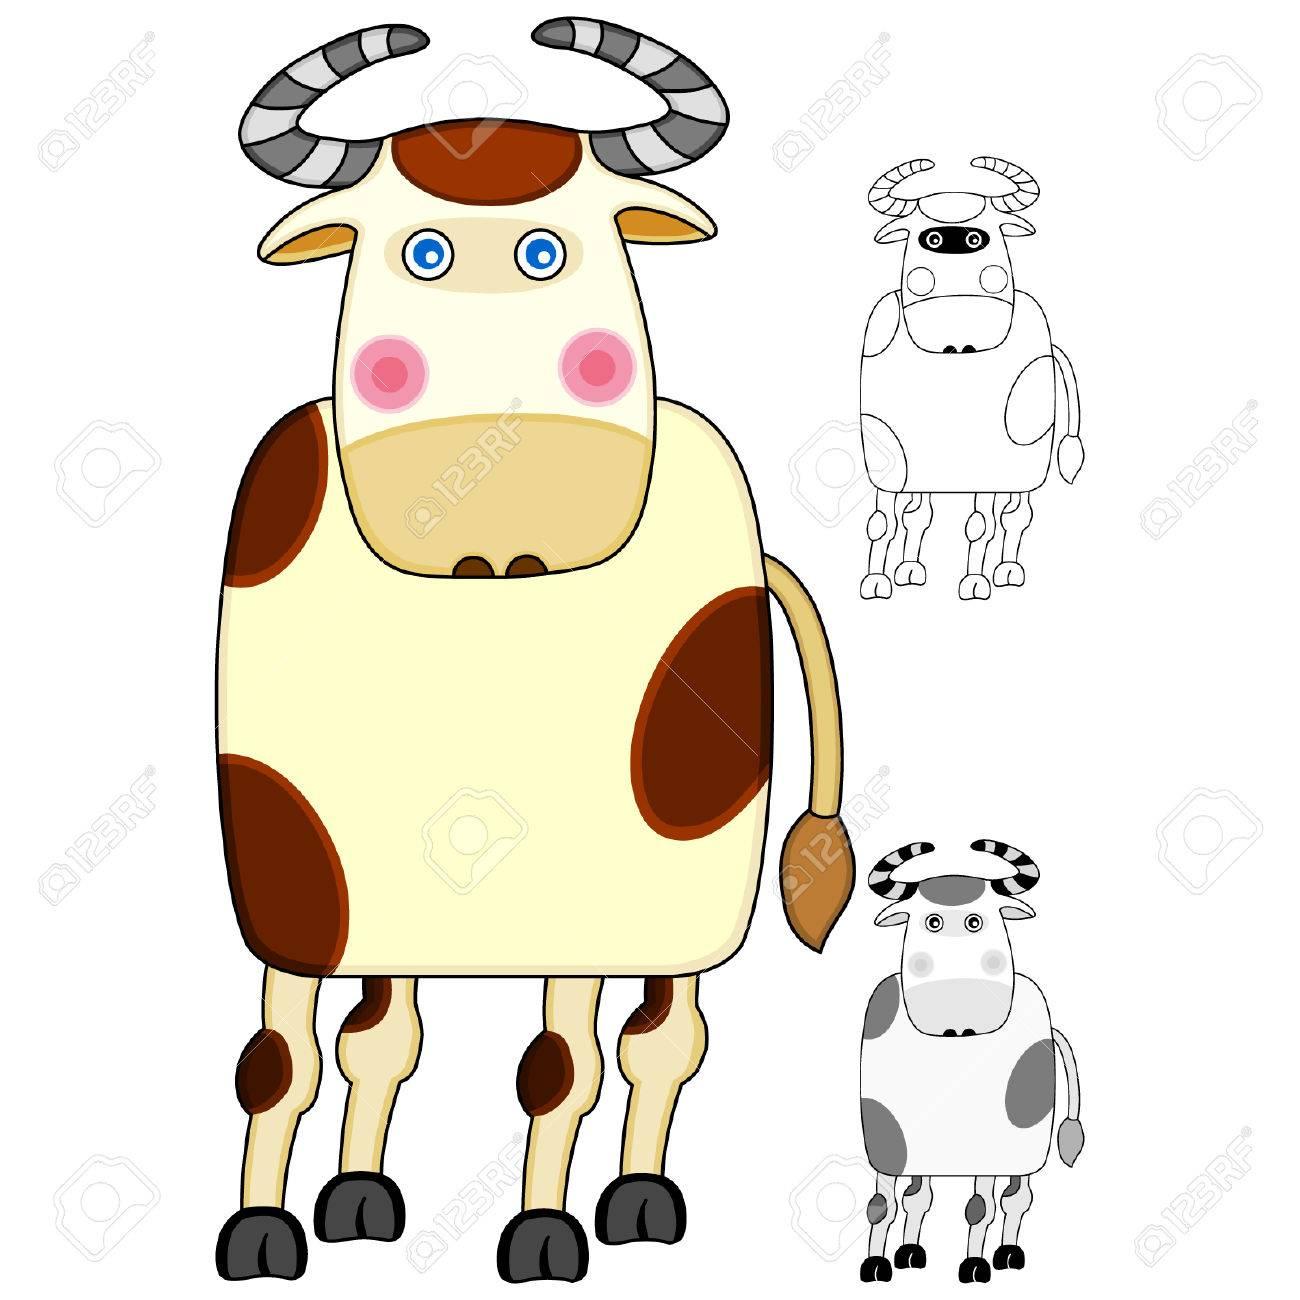 Cow Stock Vector - 4062664